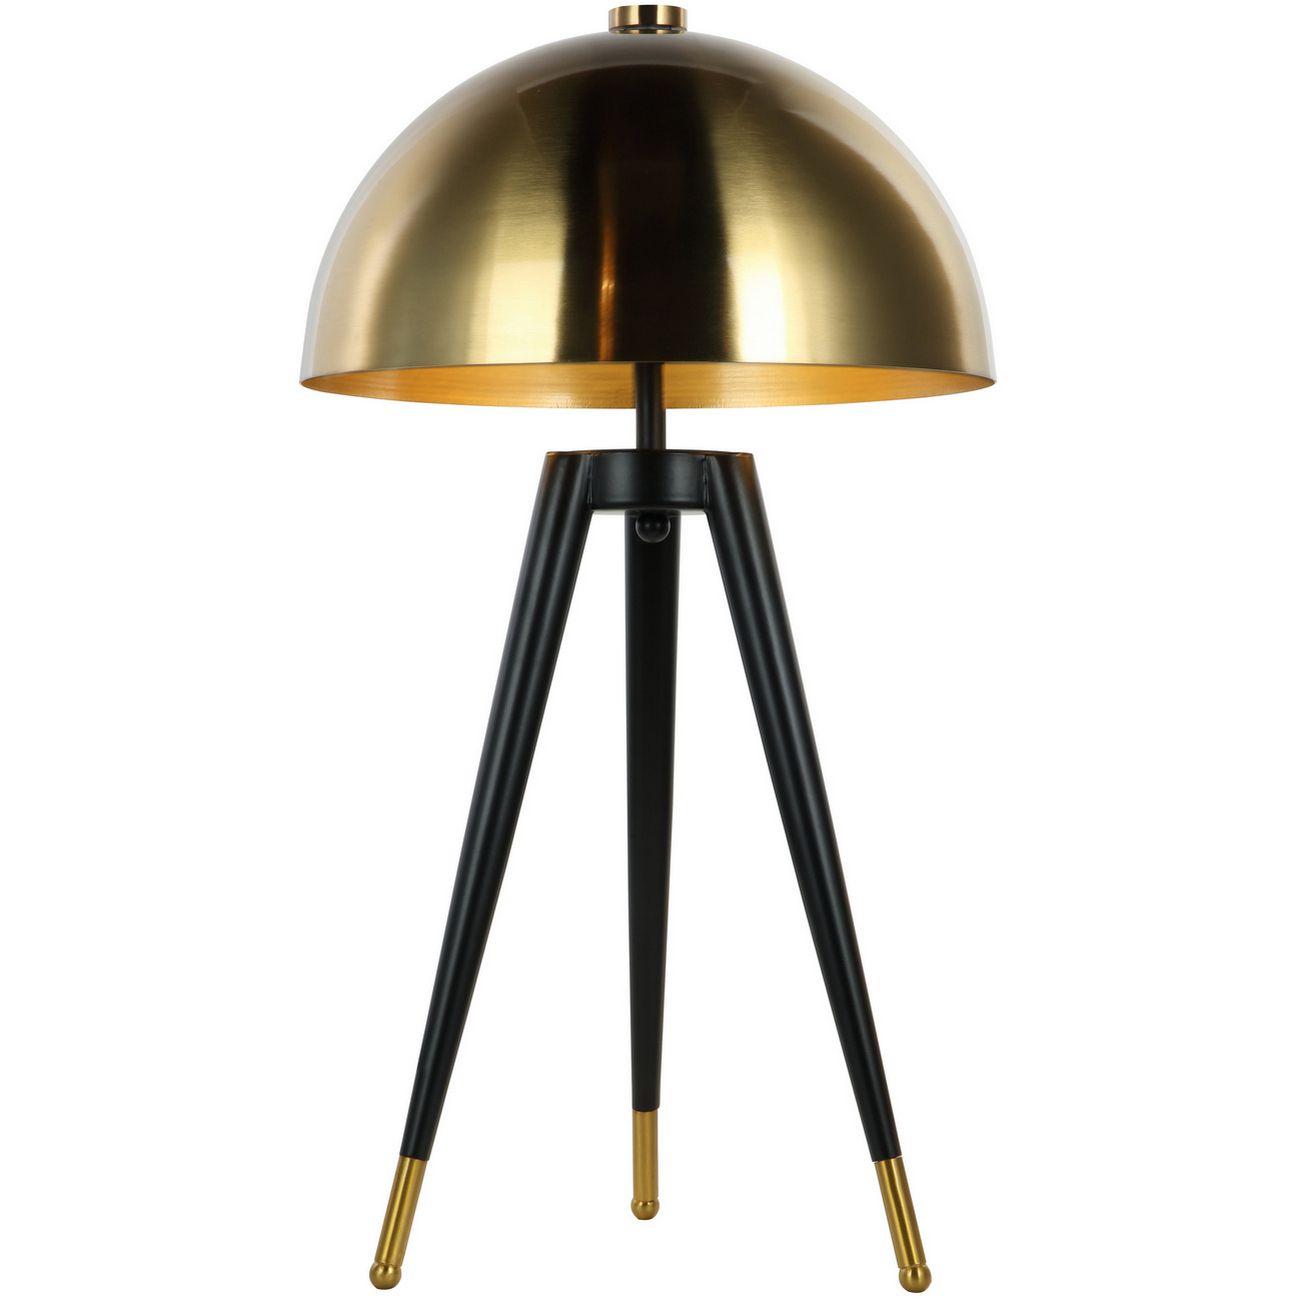 Brass Shaded Corvus Tripod Table Lamp